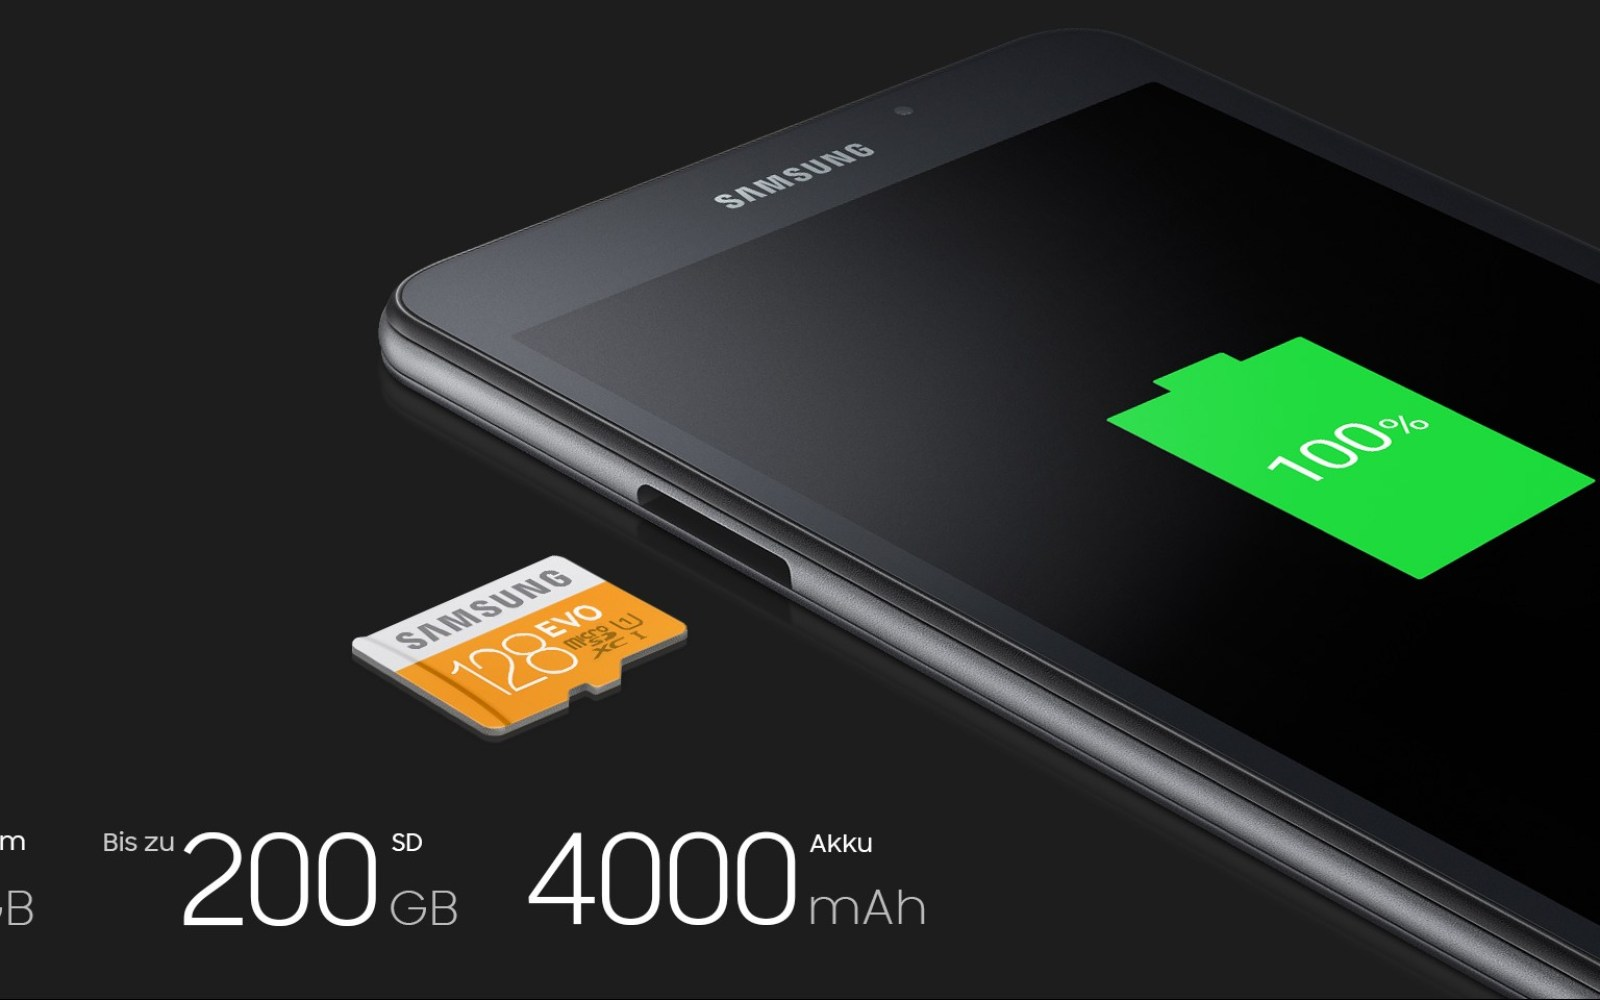 Samsung's latest tablet: the 7-inch Galaxy Tab A w/ microSD slot + 4000mAh battery